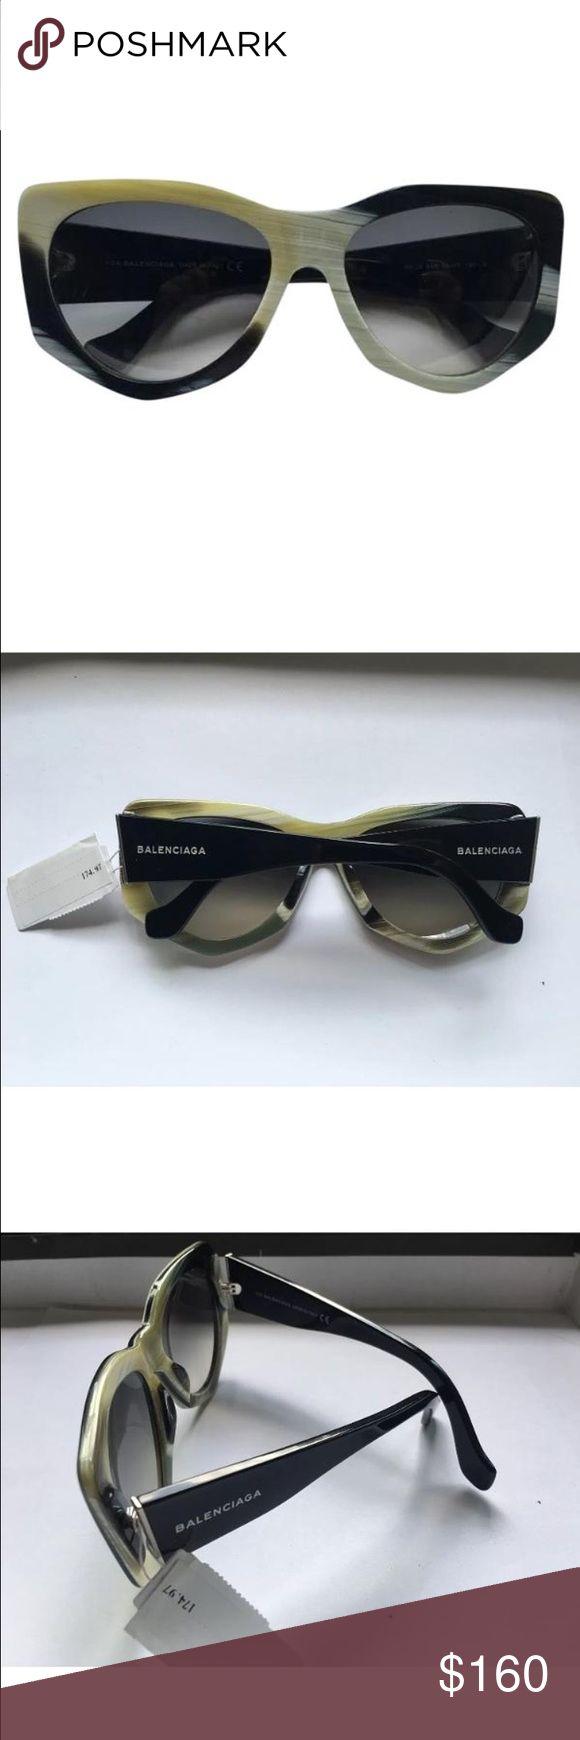 NWT!!! Balenciaga sunglasses BALENCIAGA BA 18 64B Italian Sunglasses NEW tags    100% authentic Balenciaga sunglasses  Made in Italy  No box or cloth  New with original tags Balenciaga Accessories Sunglasses